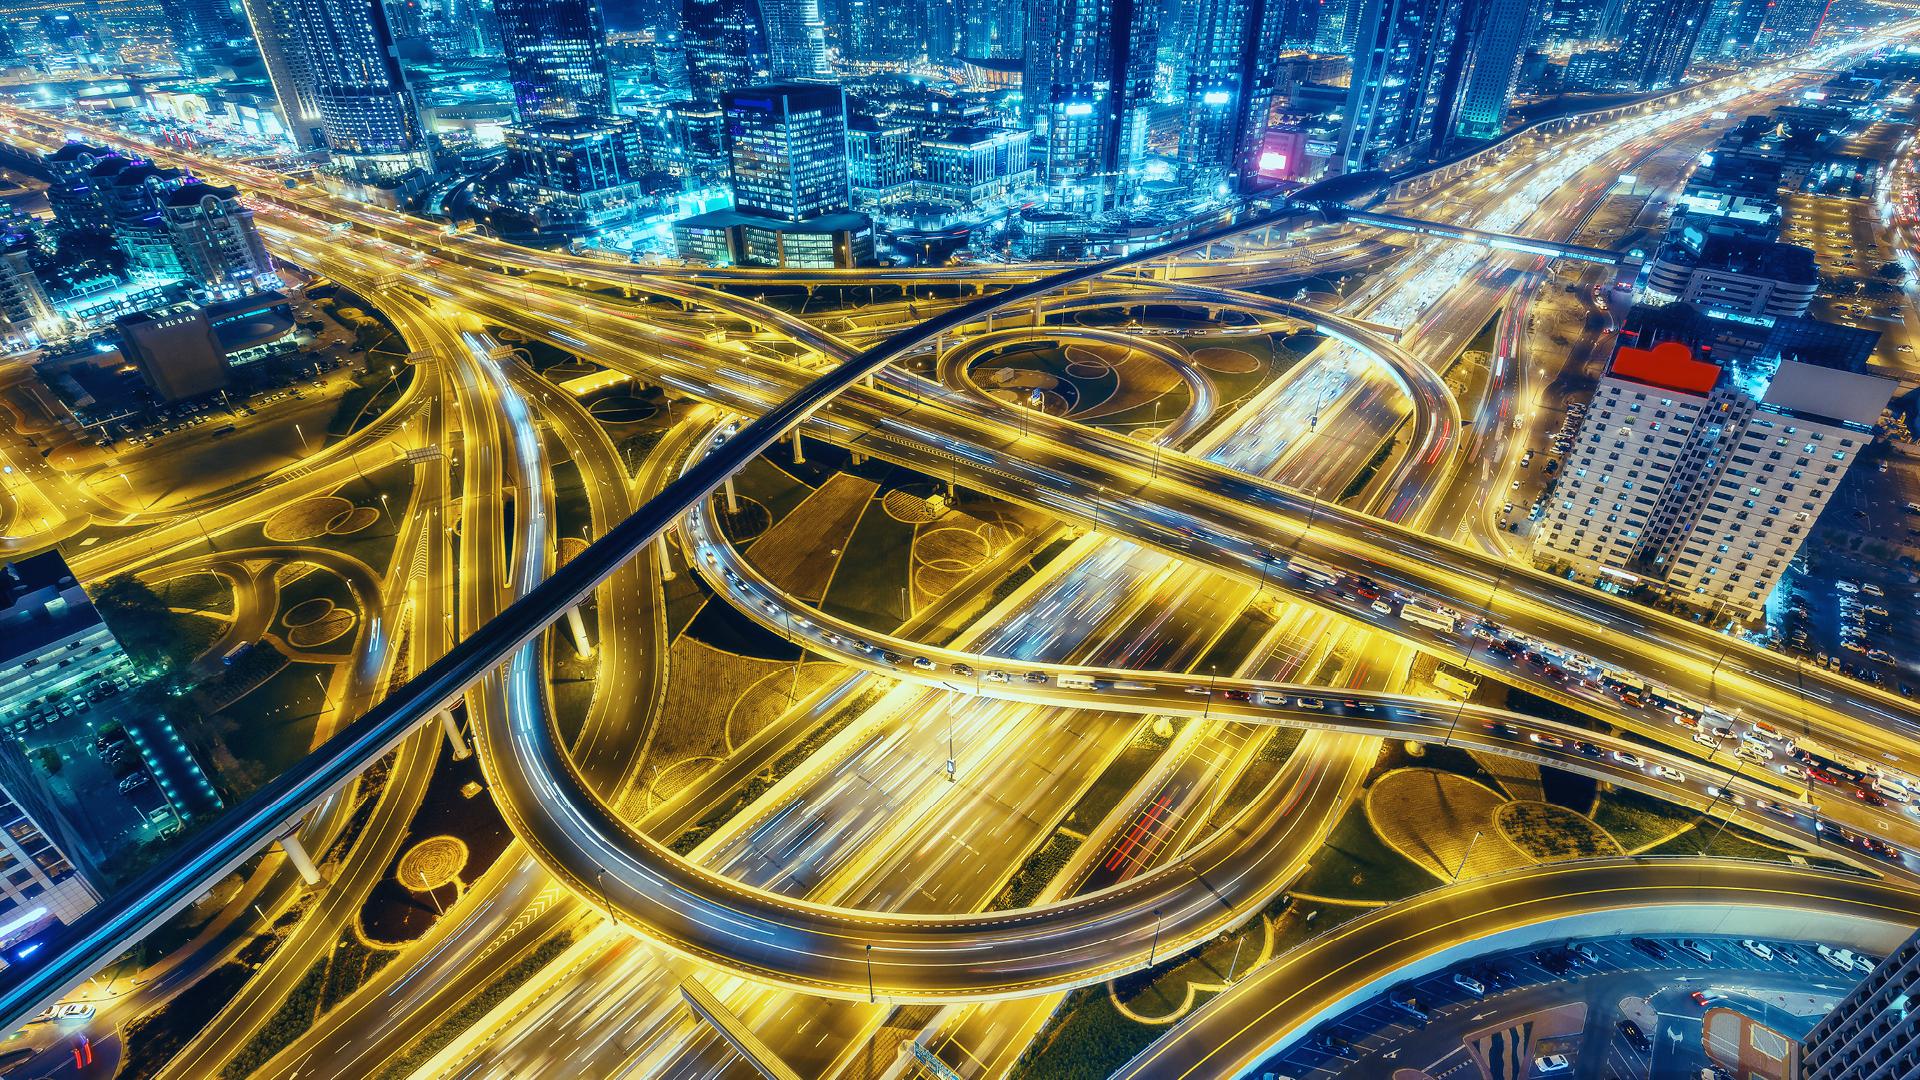 highway interchange in Dubai